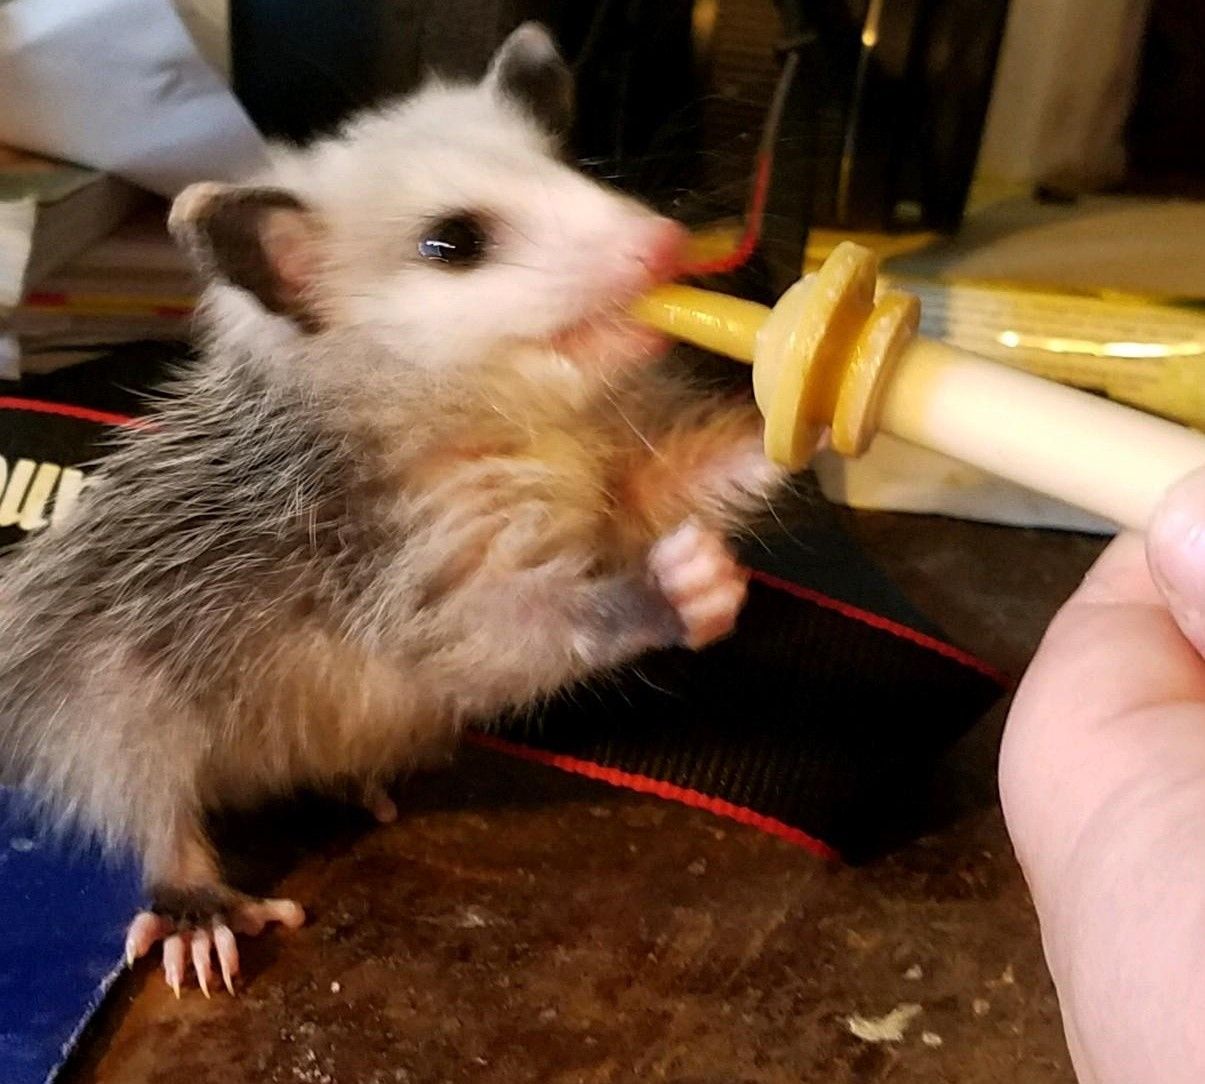 Wildlife rehabilitation at Fox Run